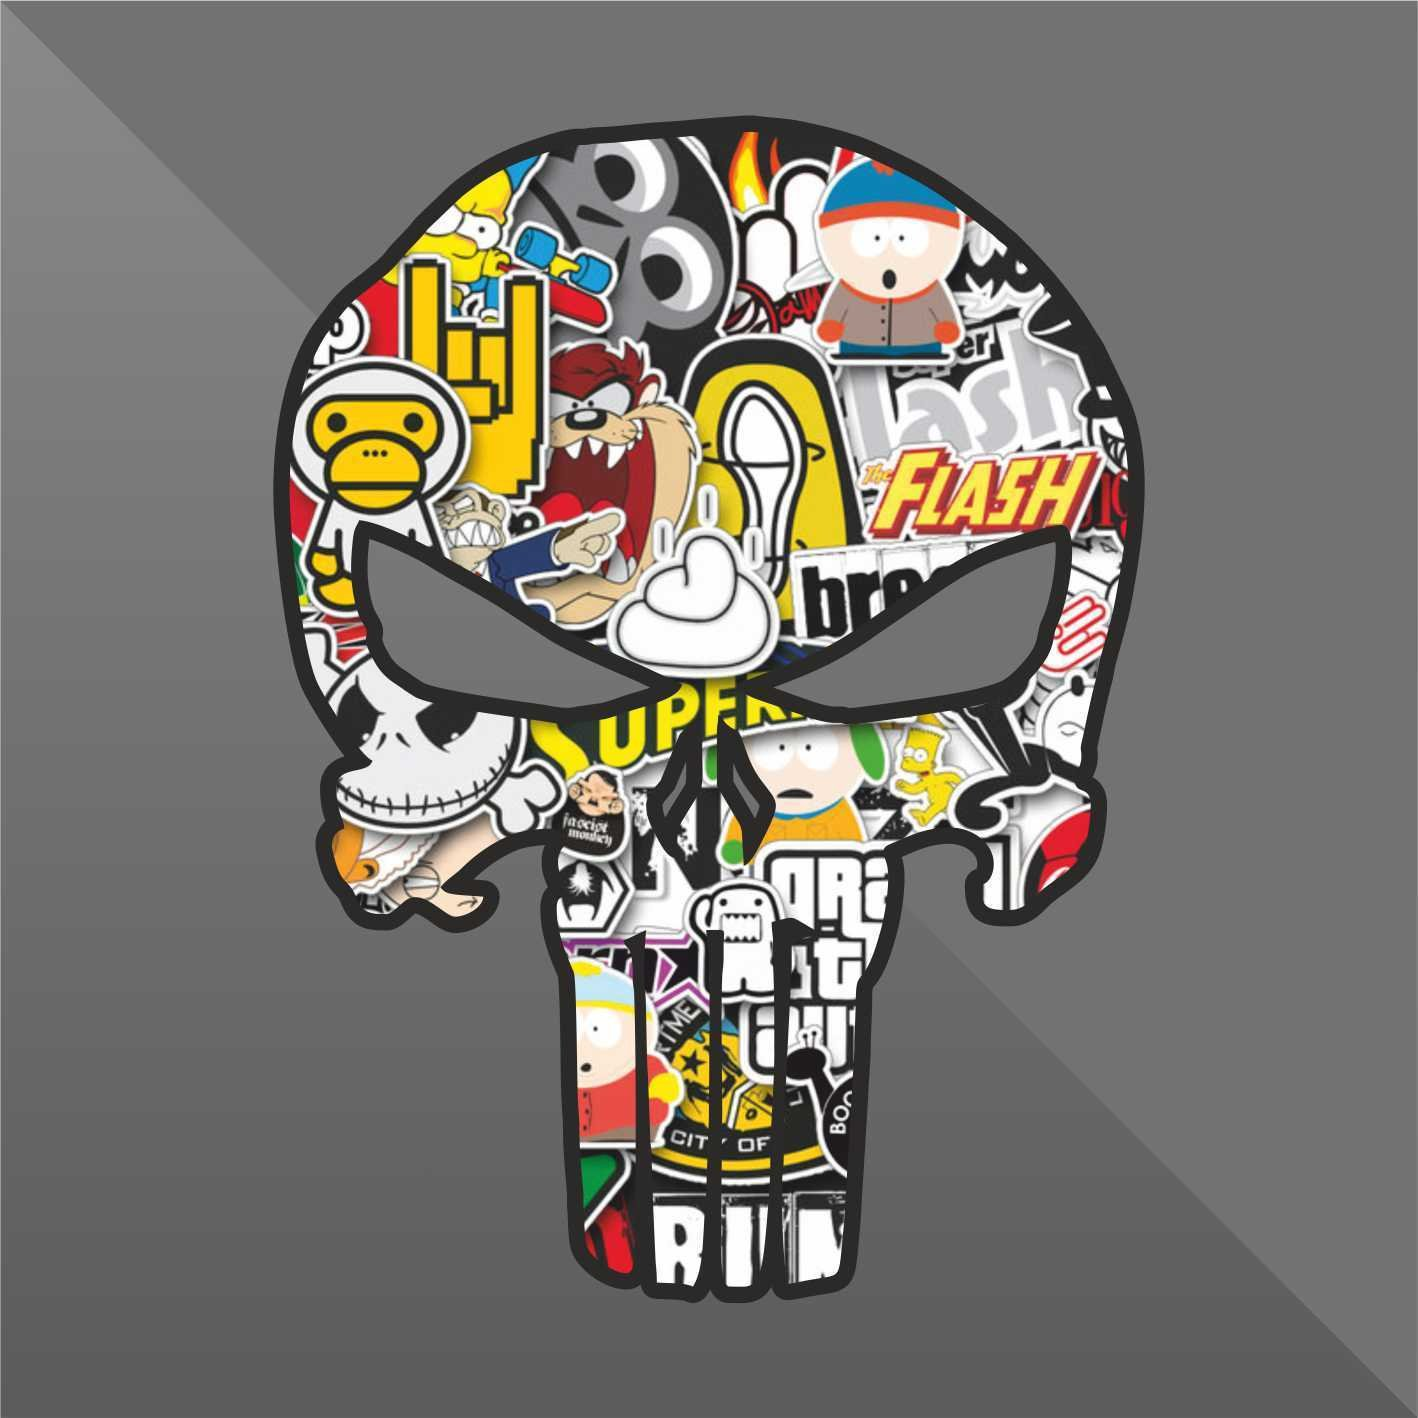 Decal Punisher Teschio Skull Cr/âne Cr/áneo Sch/ädel Sticker Bomb cm 10 Decal Cars Motorcycles Helmet Wall Camper Bike Adesivo Adhesive Autocollant Pegatina Aufkleber